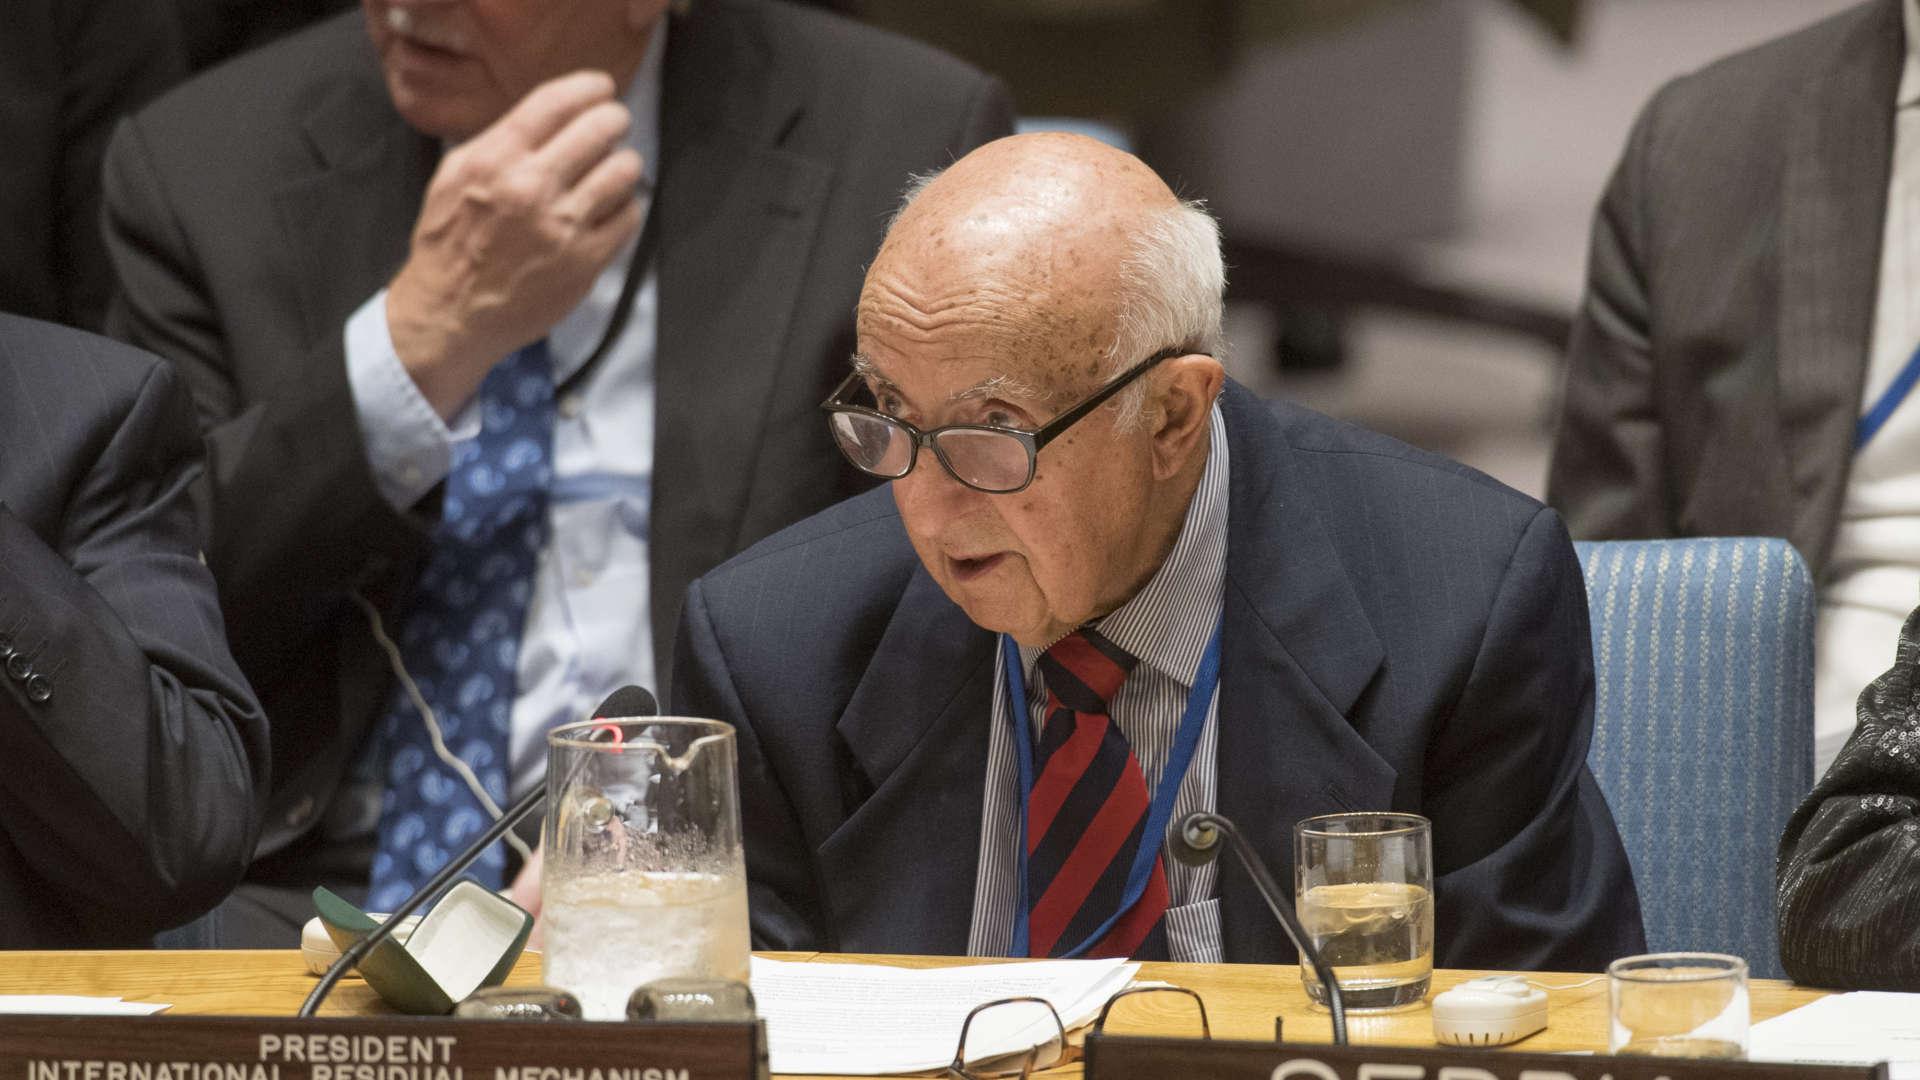 President of the Mechanism for International Criminal Tribunals, Judge Theodor Meron (UN photo)